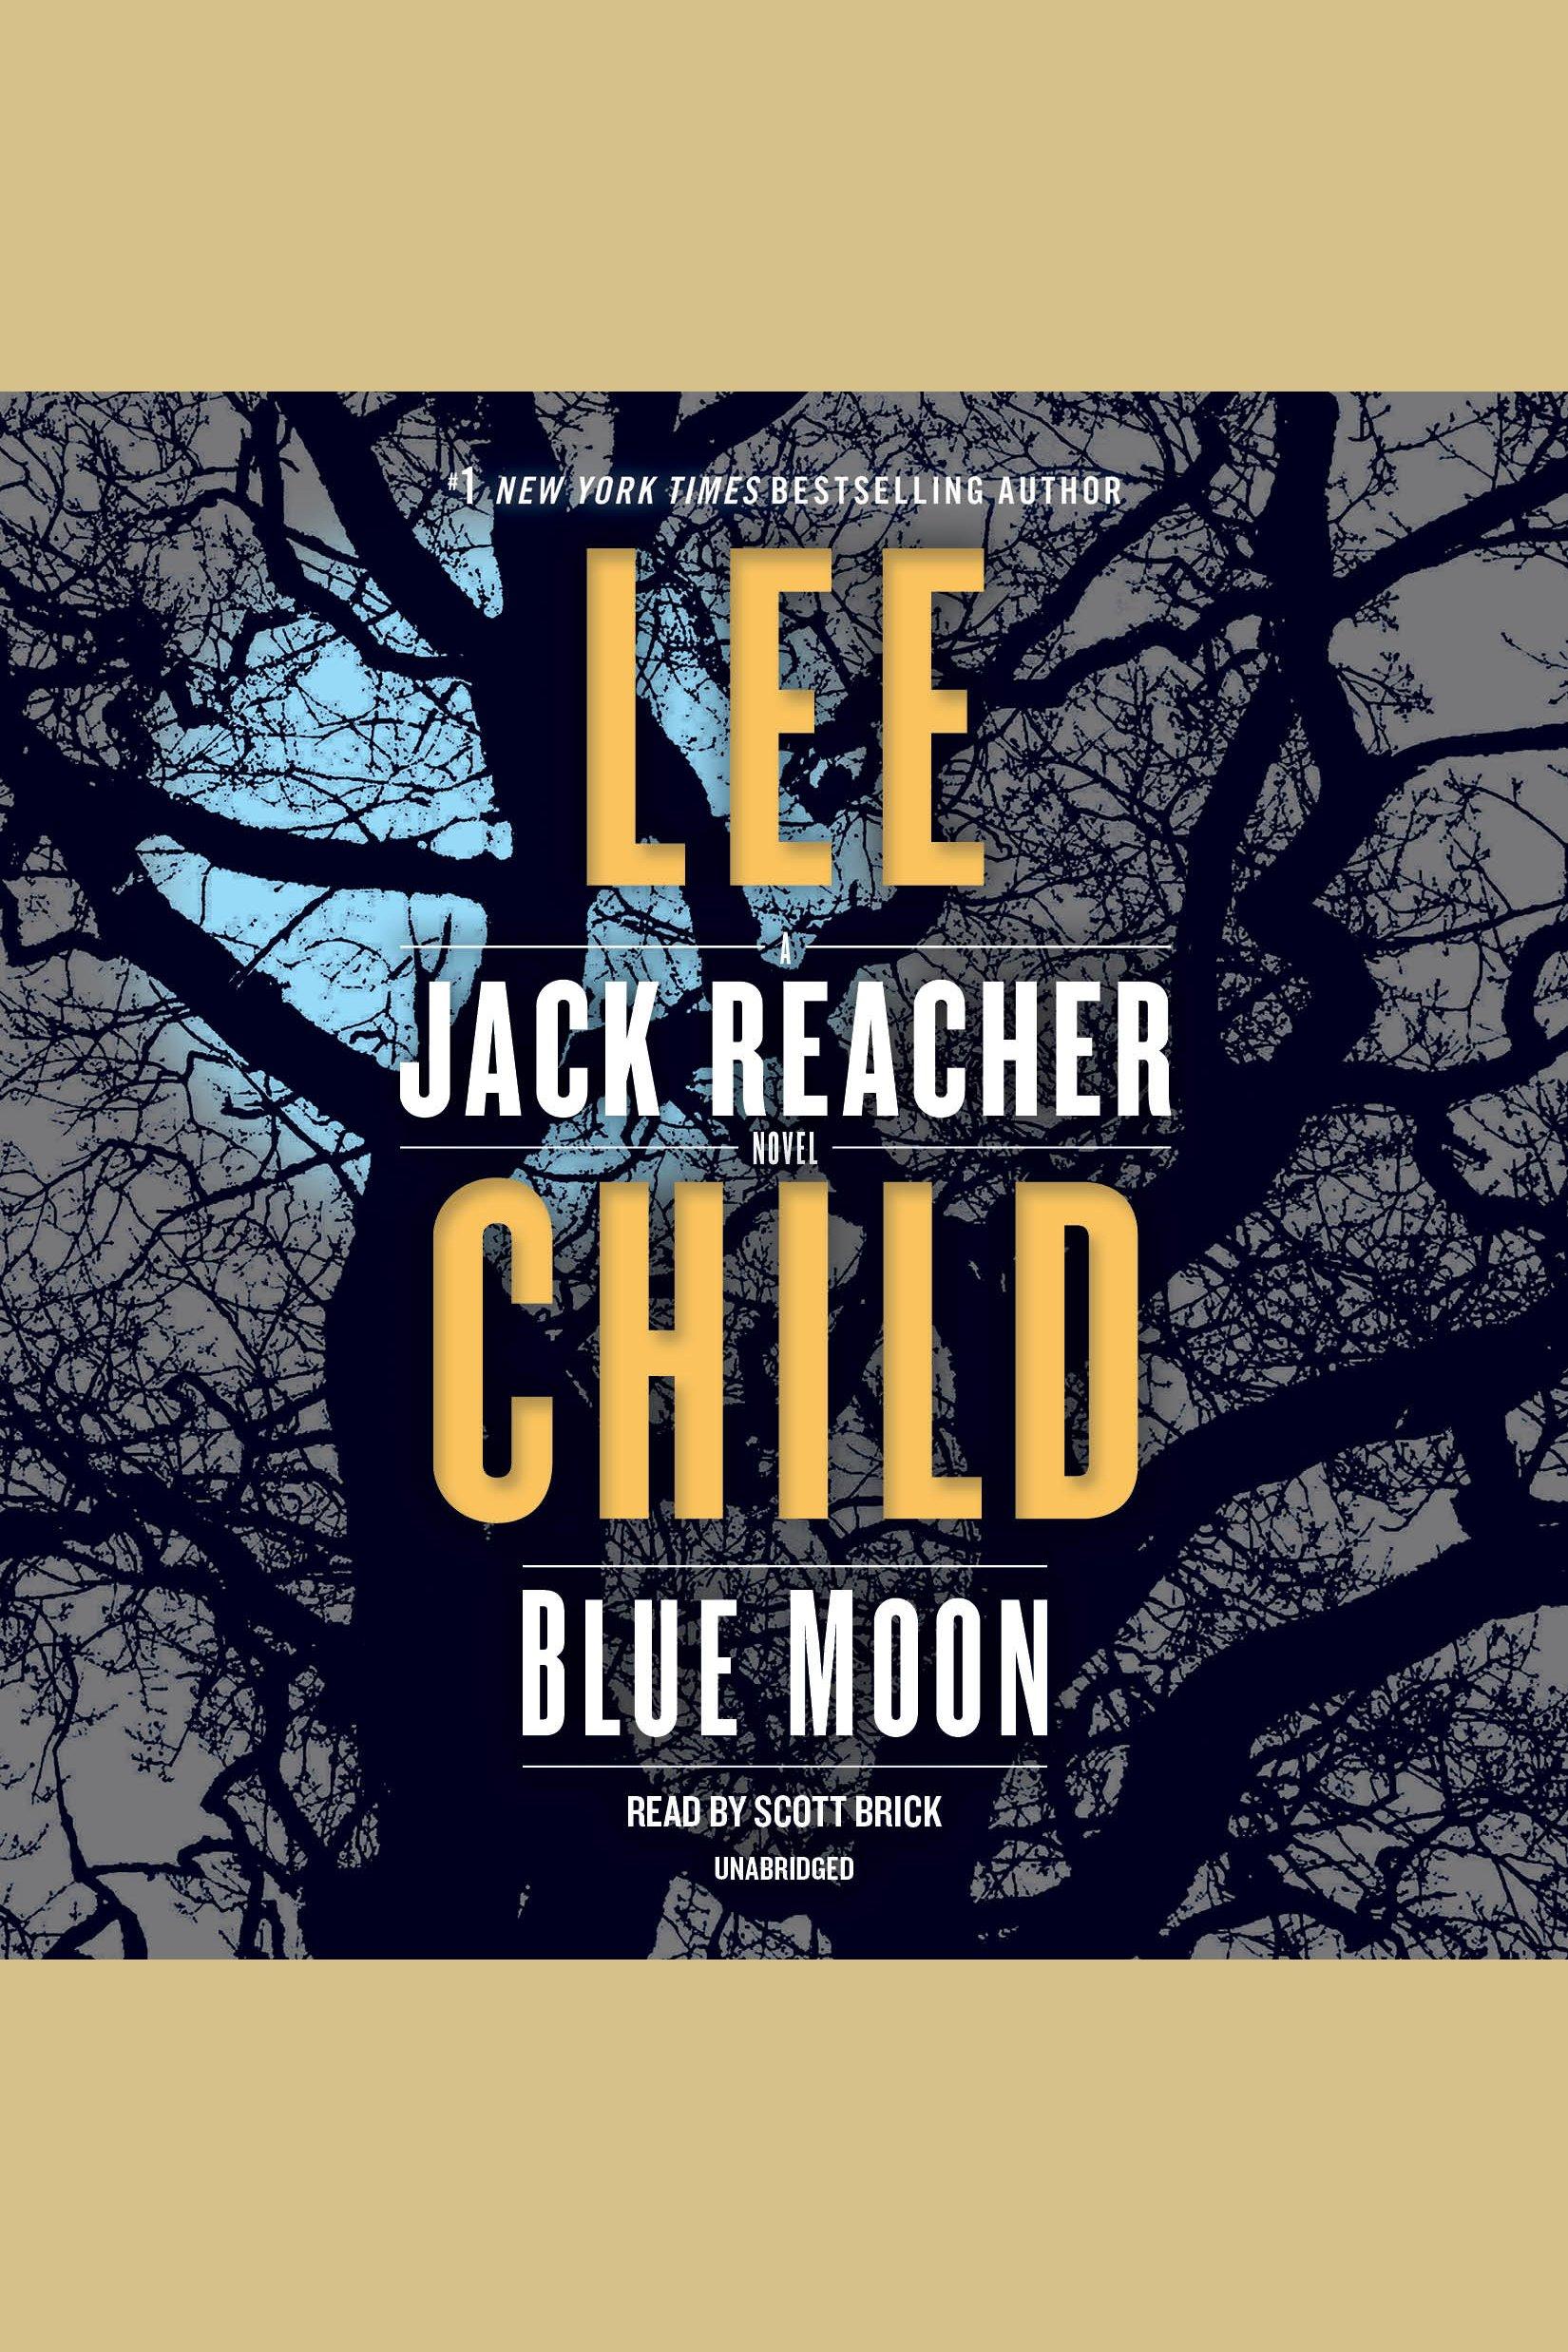 Blue Moon [electronic resource] : A Jack Reacher Novel